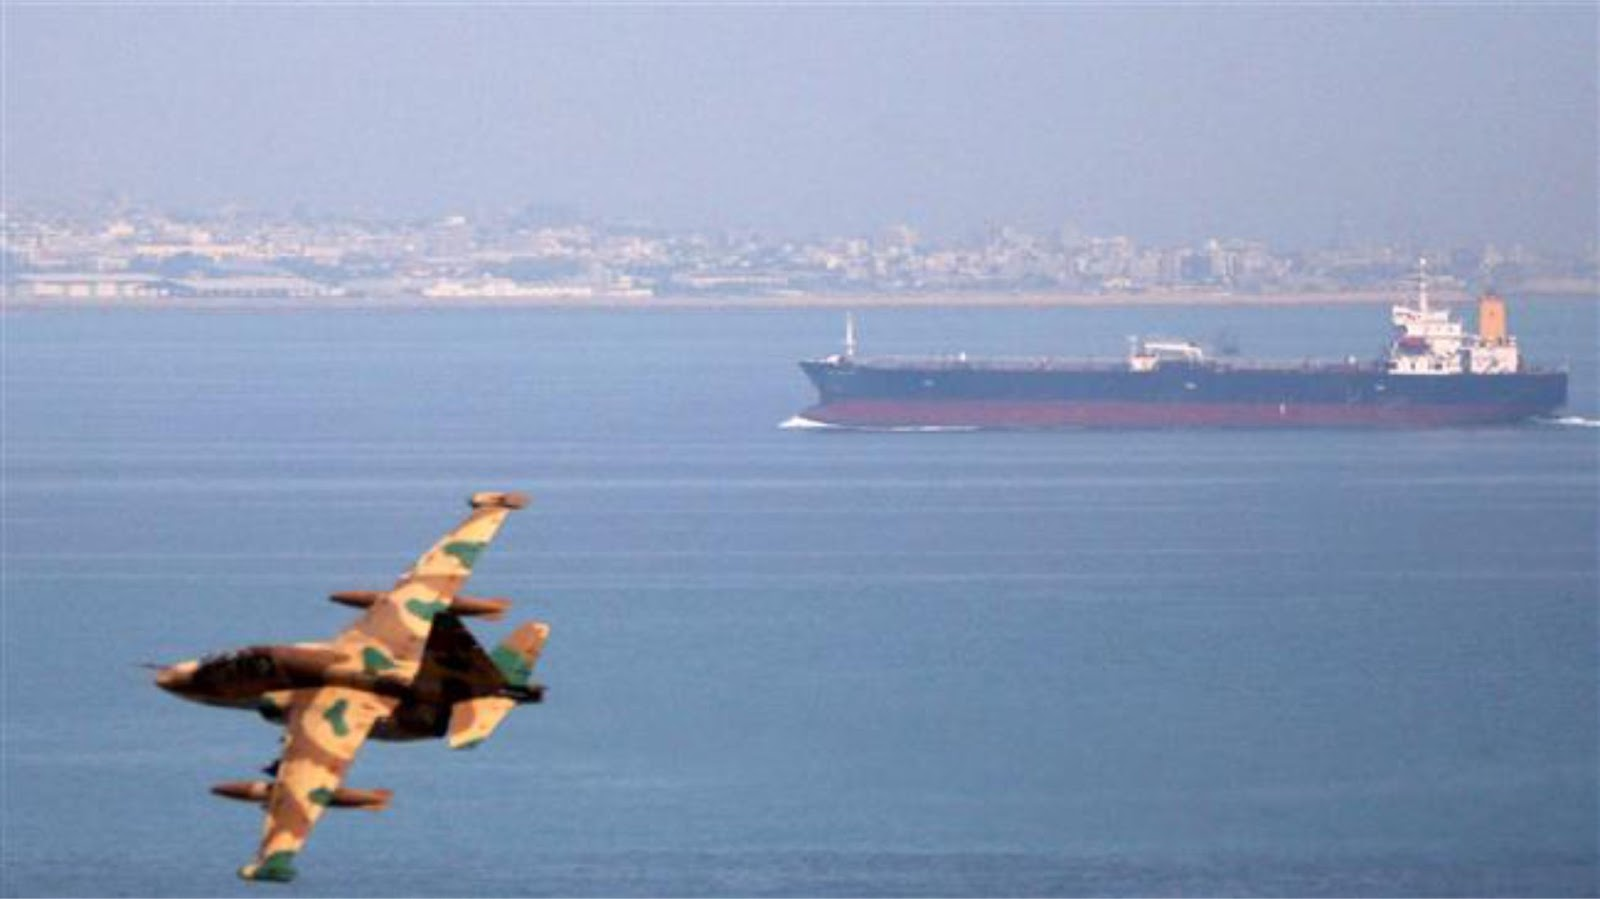 langkah-langkah keamanan di Teluk Persia harus dikembangkan oleh negara-negara di kawasan itu